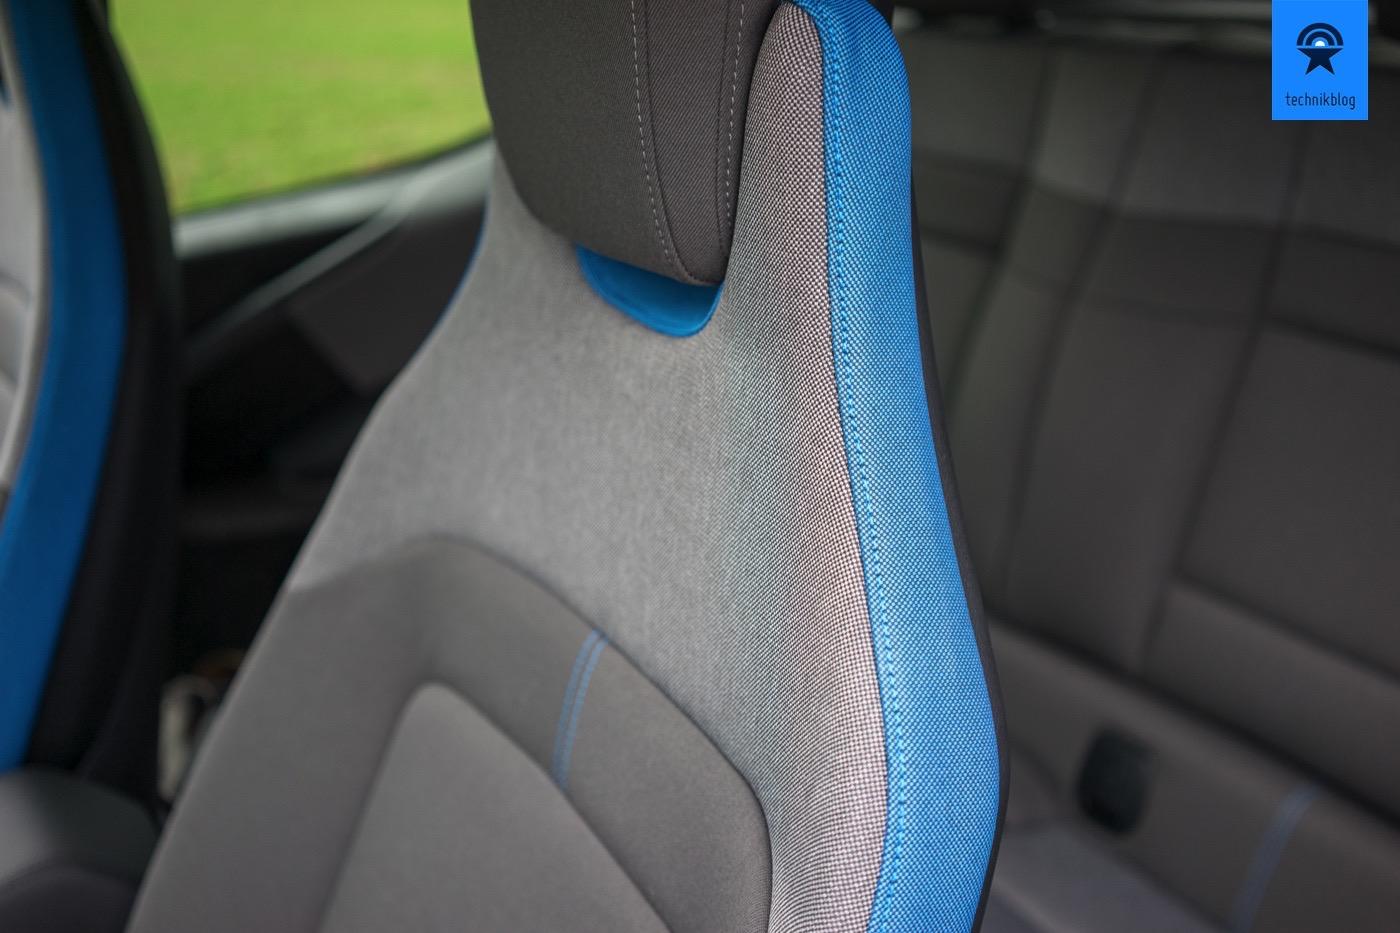 BMW i3 Sitzpolster sind aus recyceltem PET